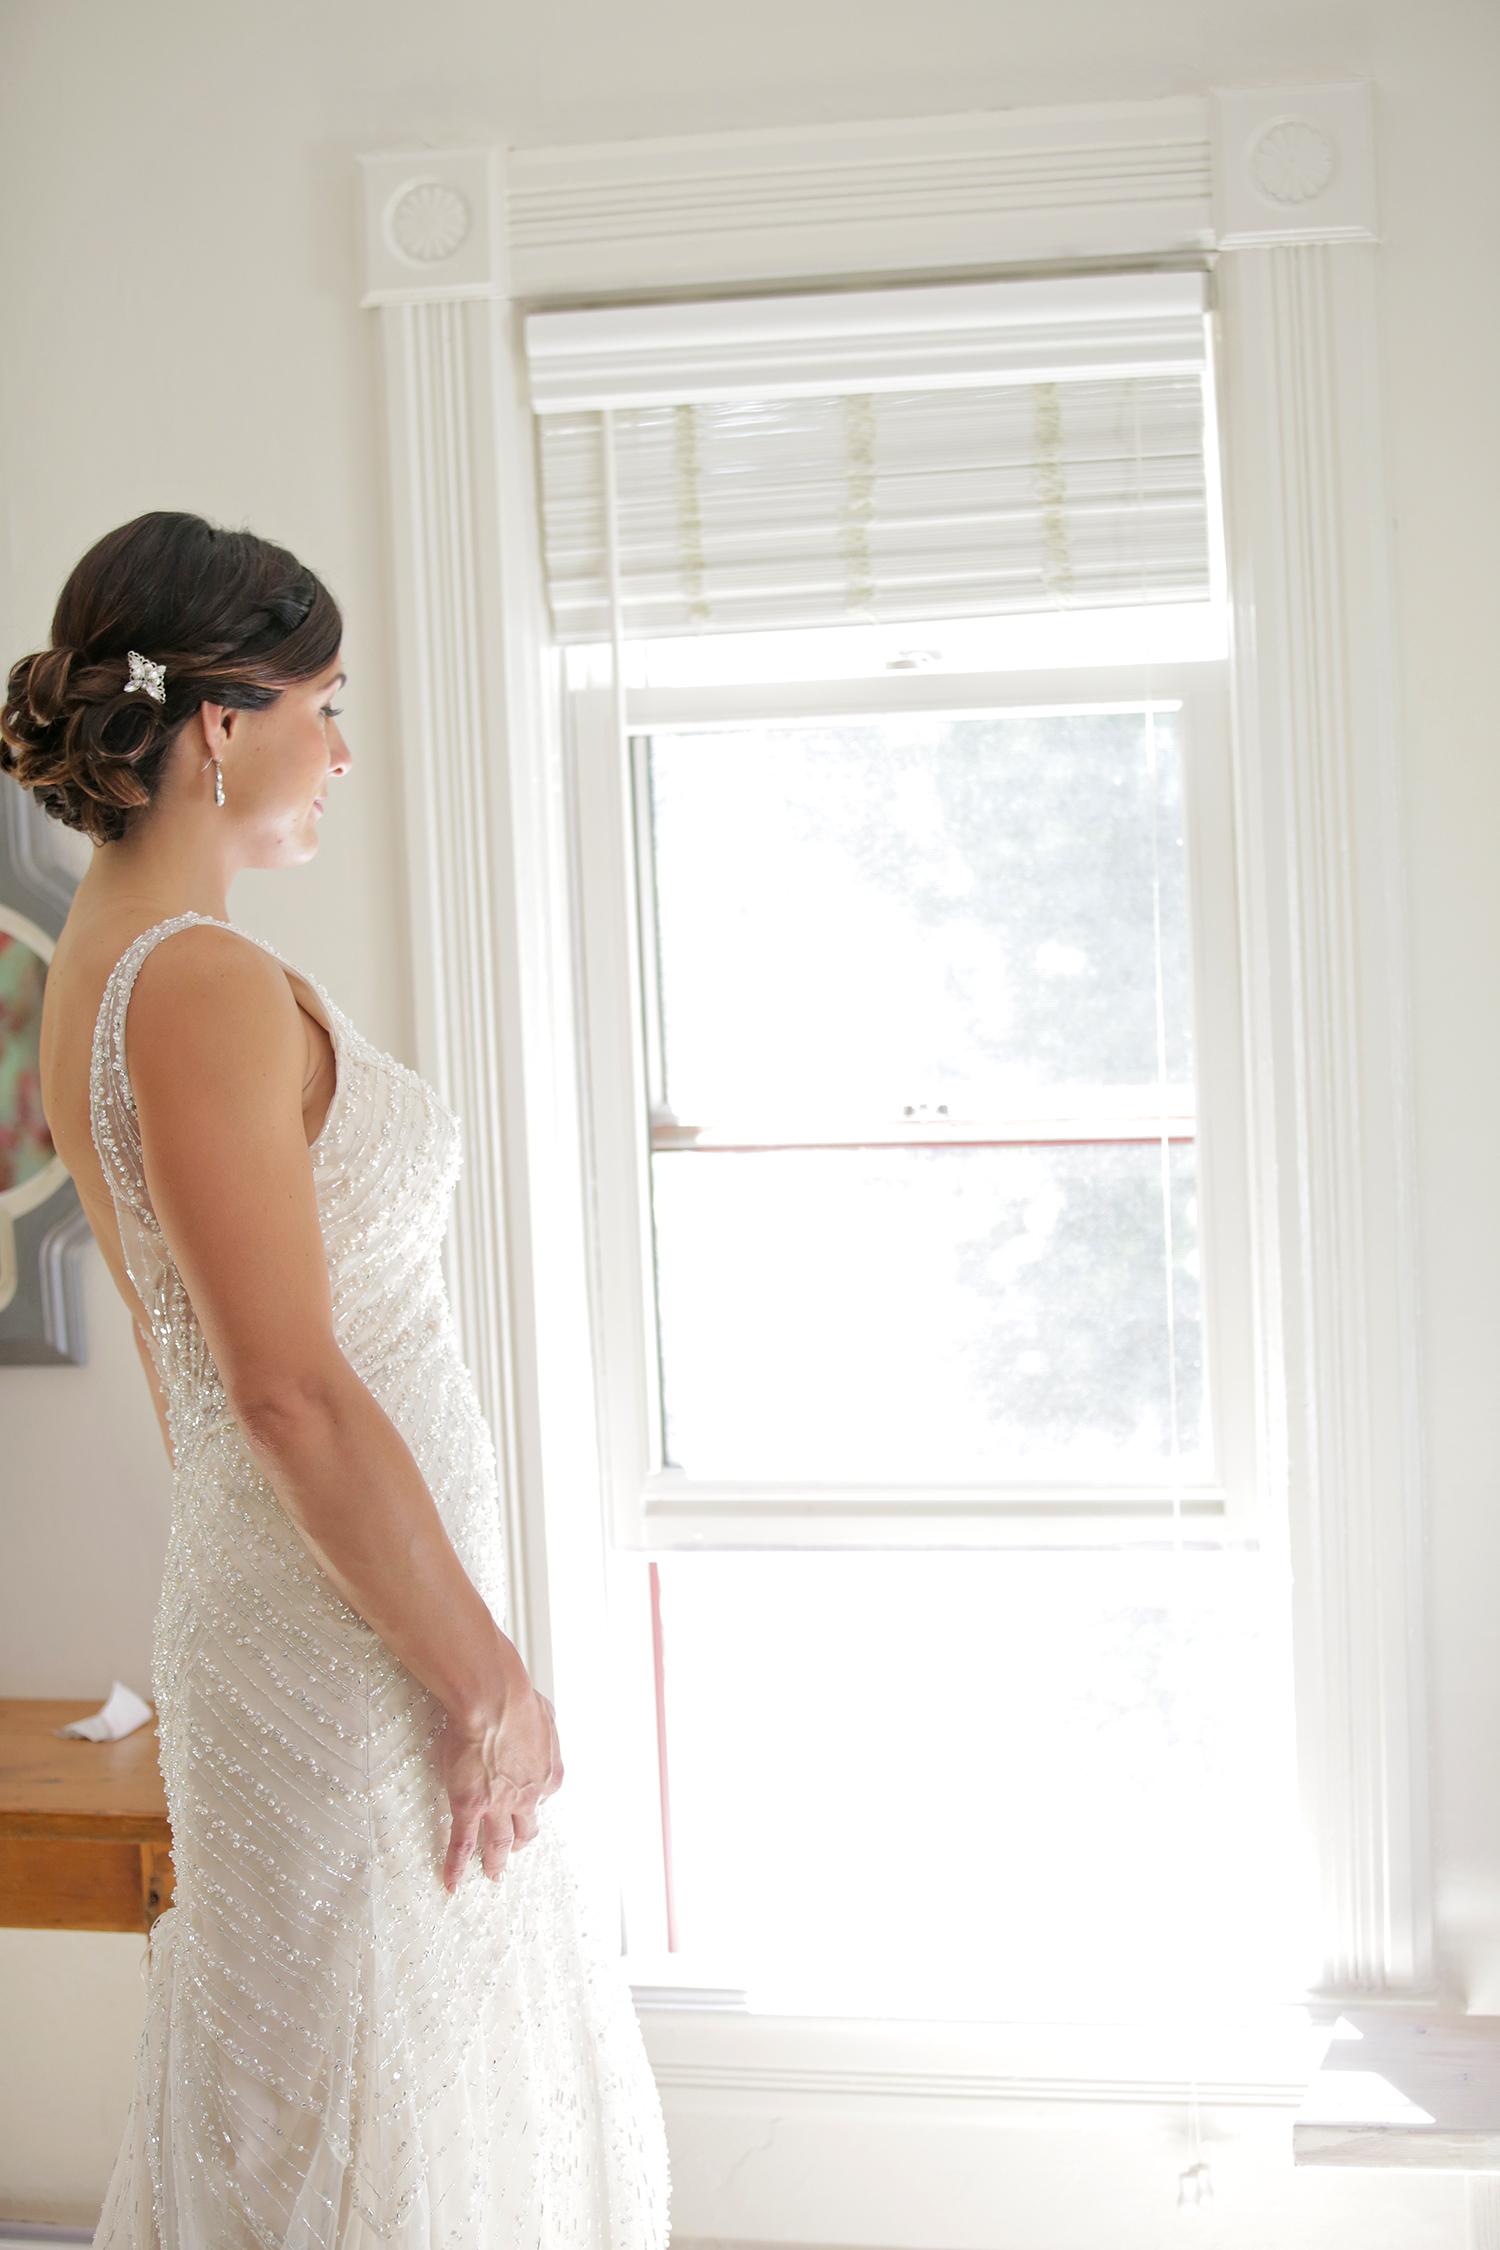 bedroom window#1(WEB).jpg